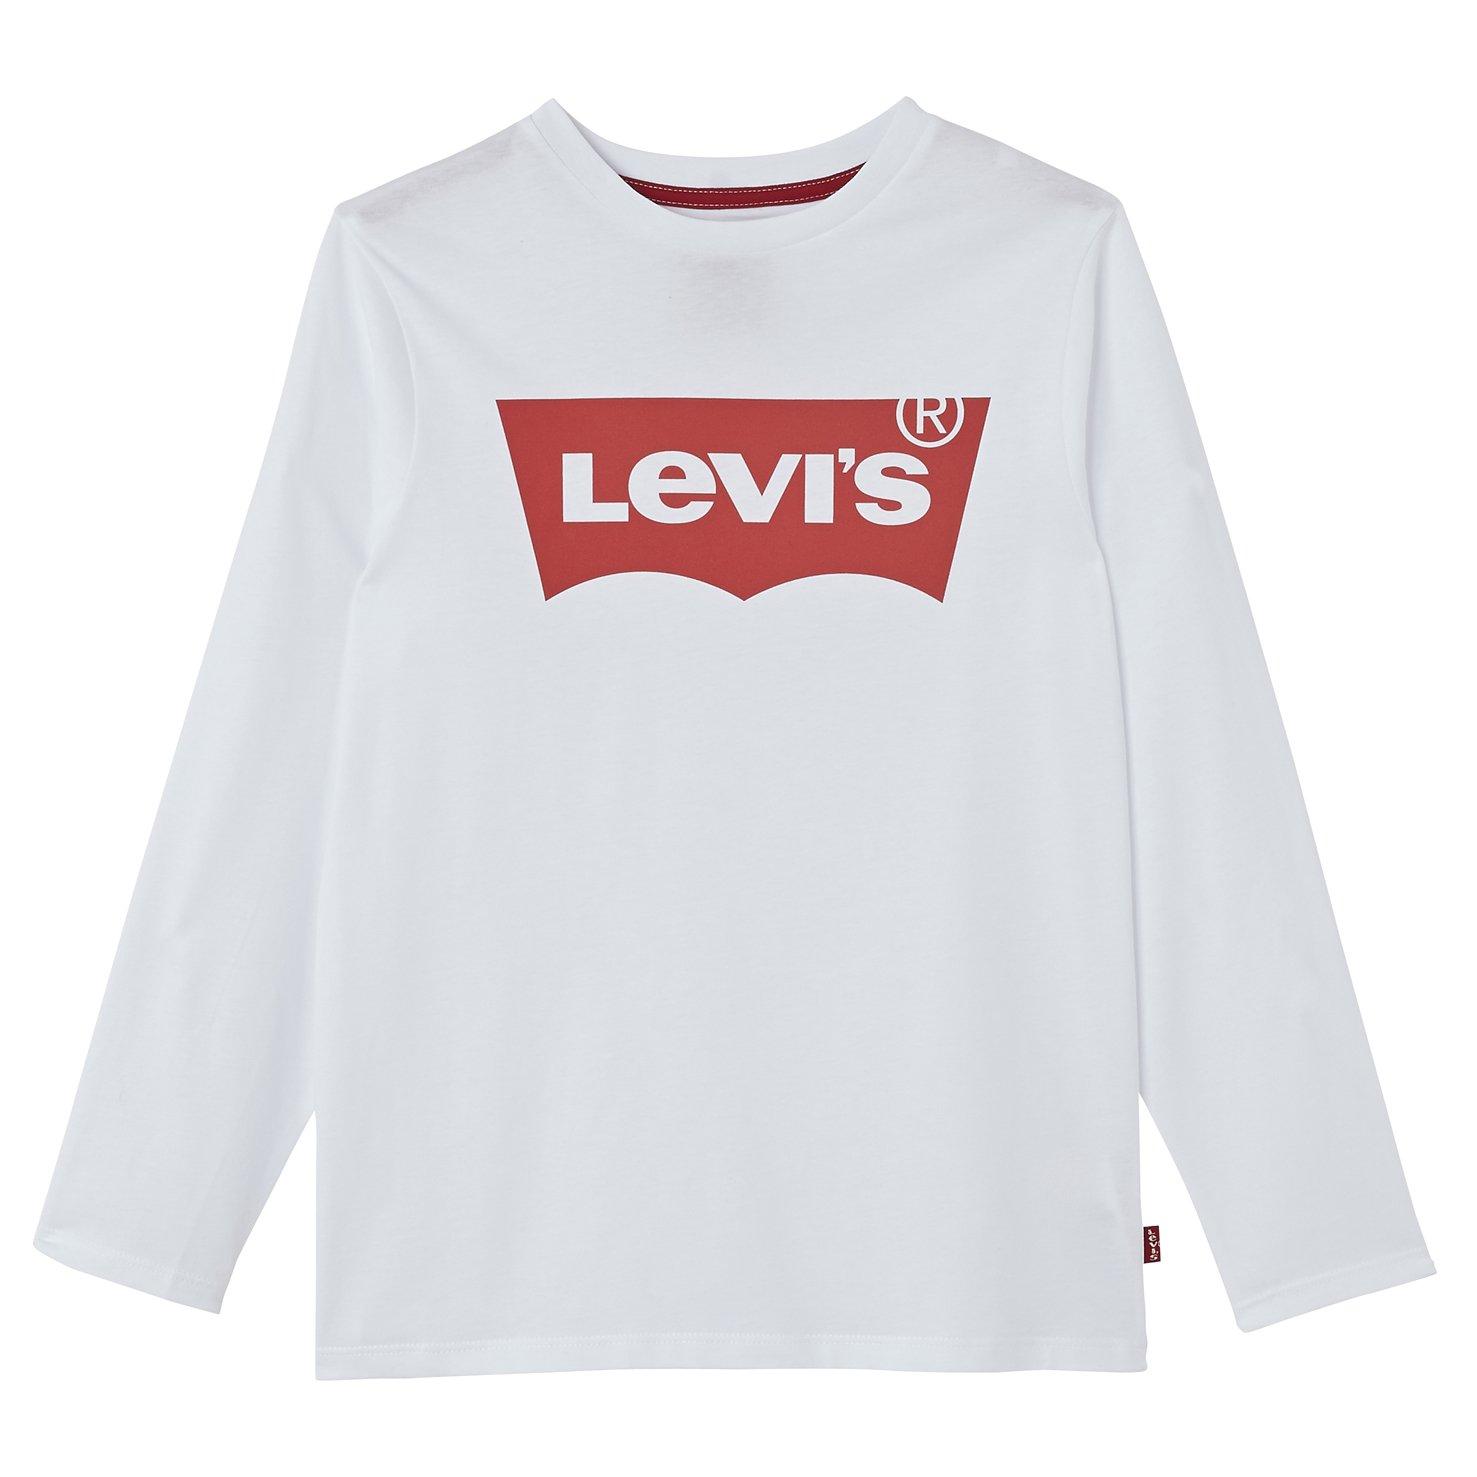 Levis N91005H, Camiseta para Niños product image